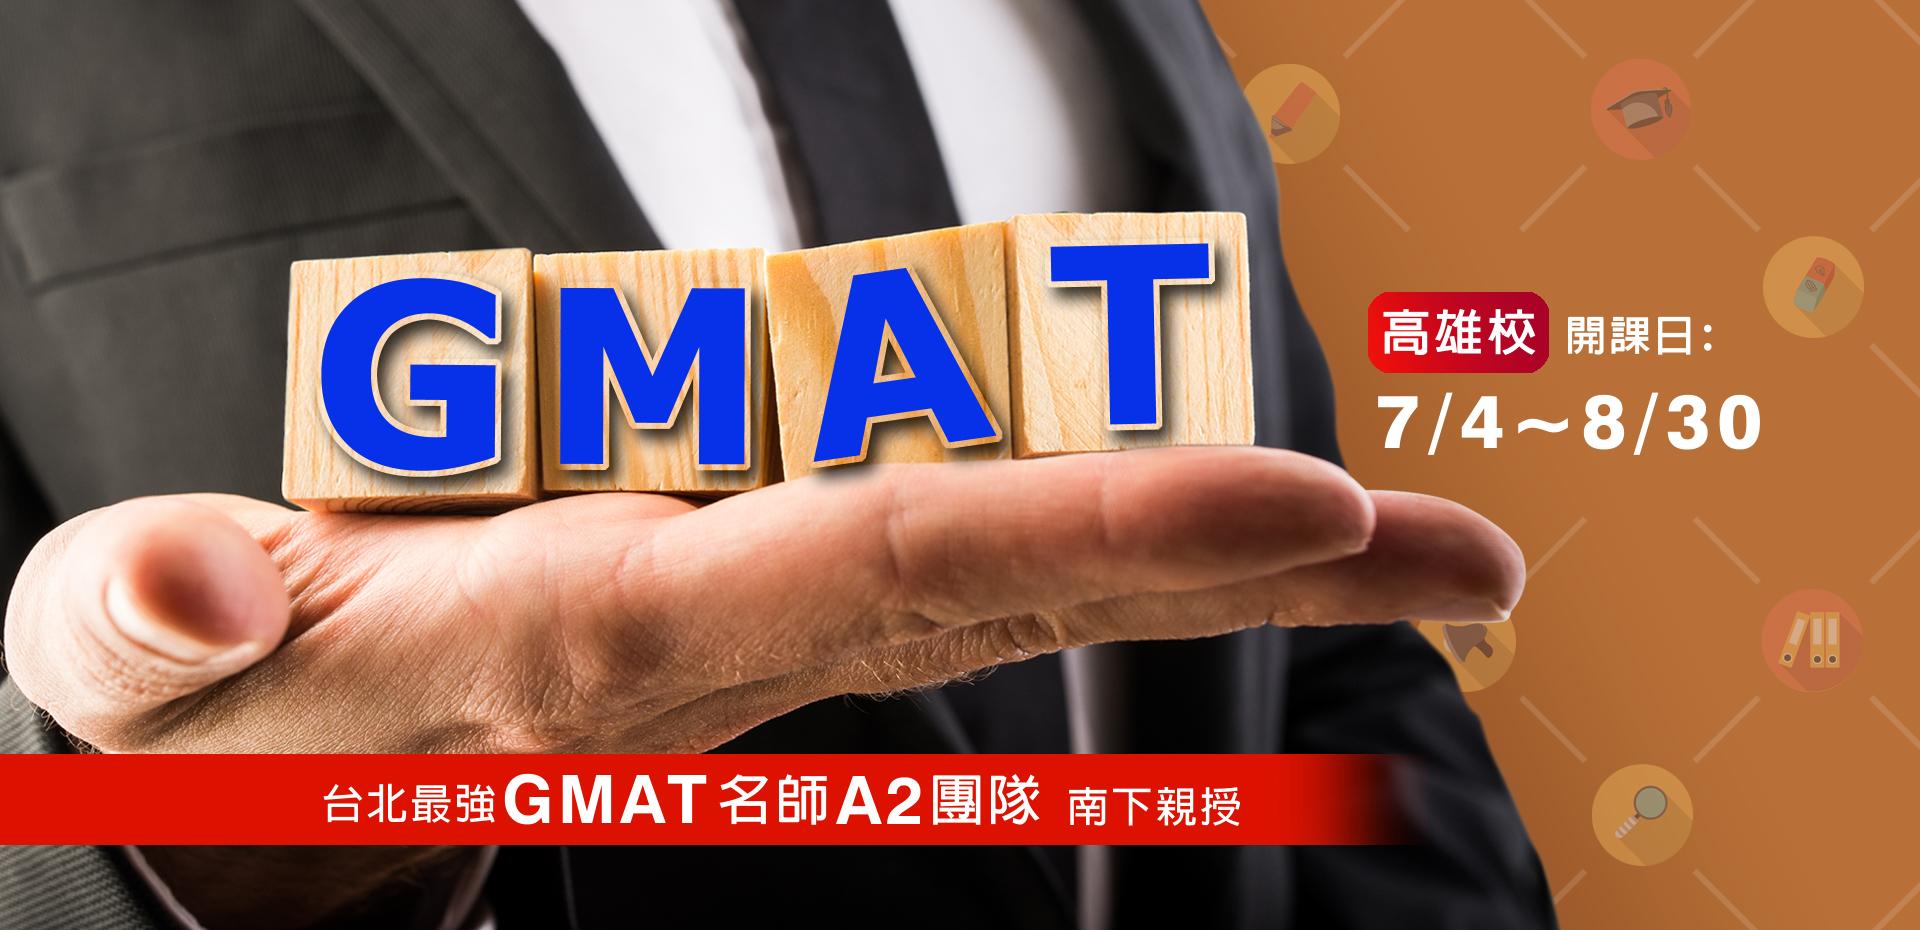 GMAT暑期班(高雄班)